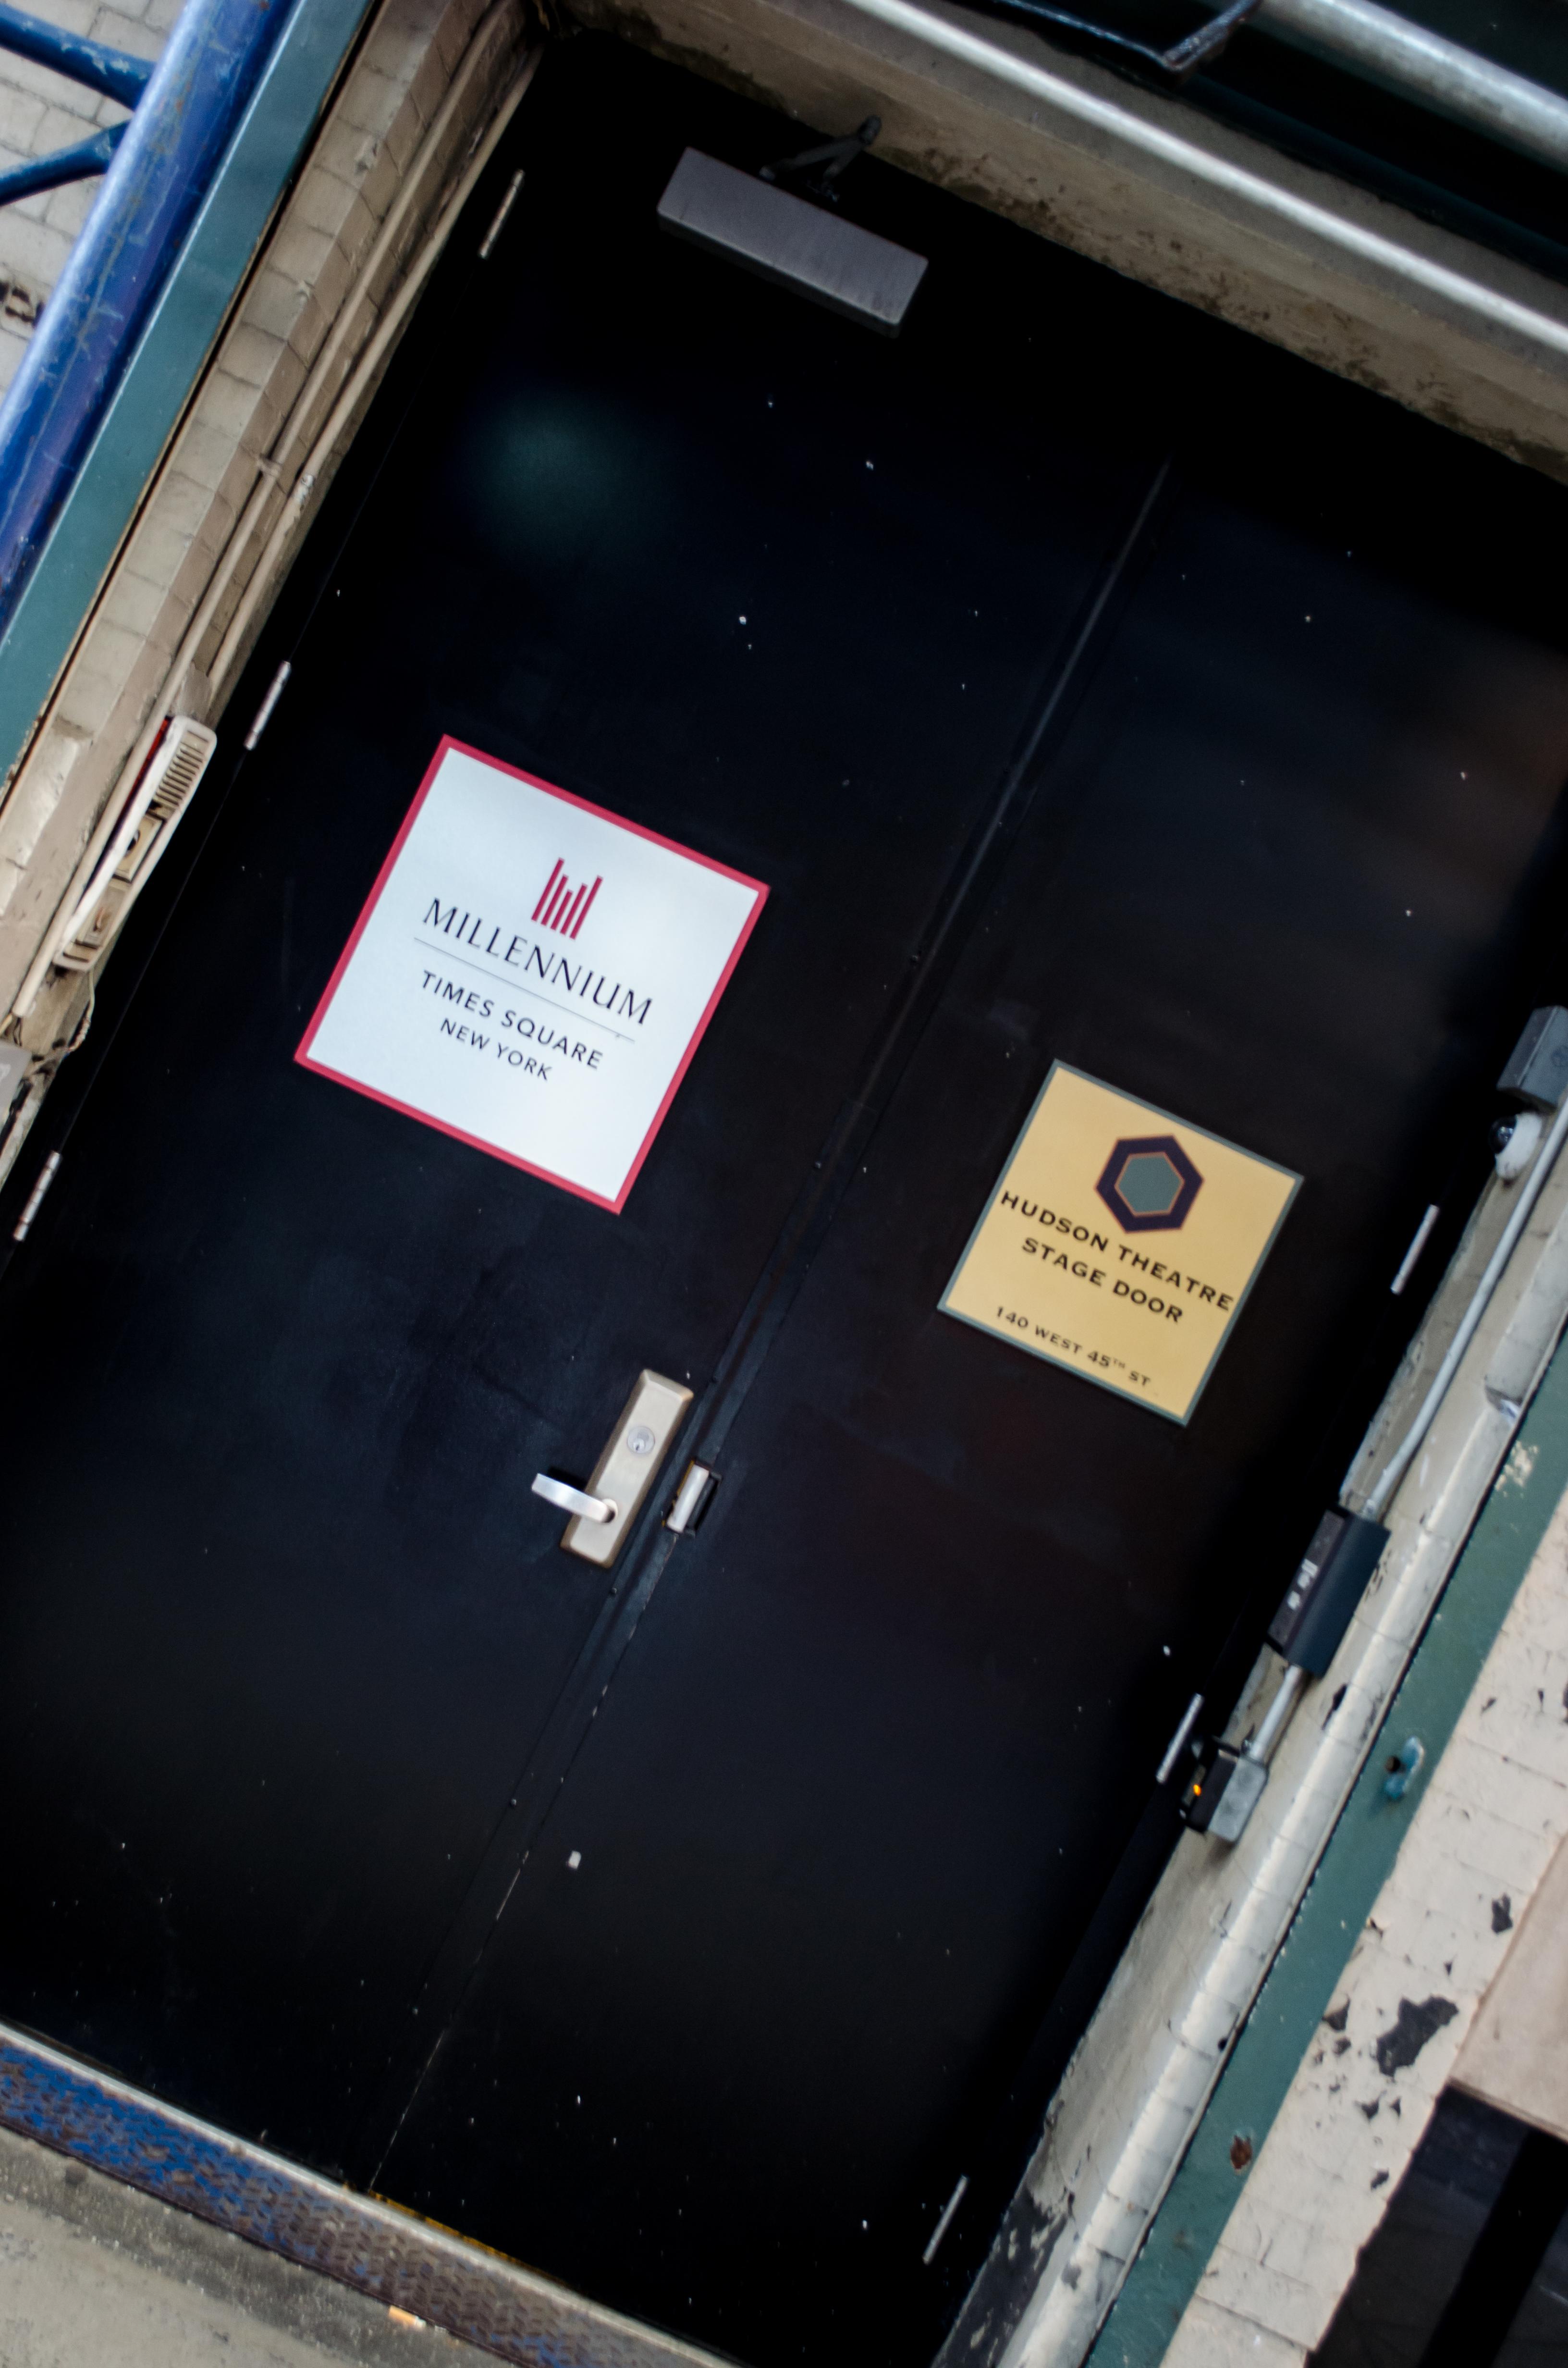 Hudson Theatre (Broadway) - Theater Information Stage Door